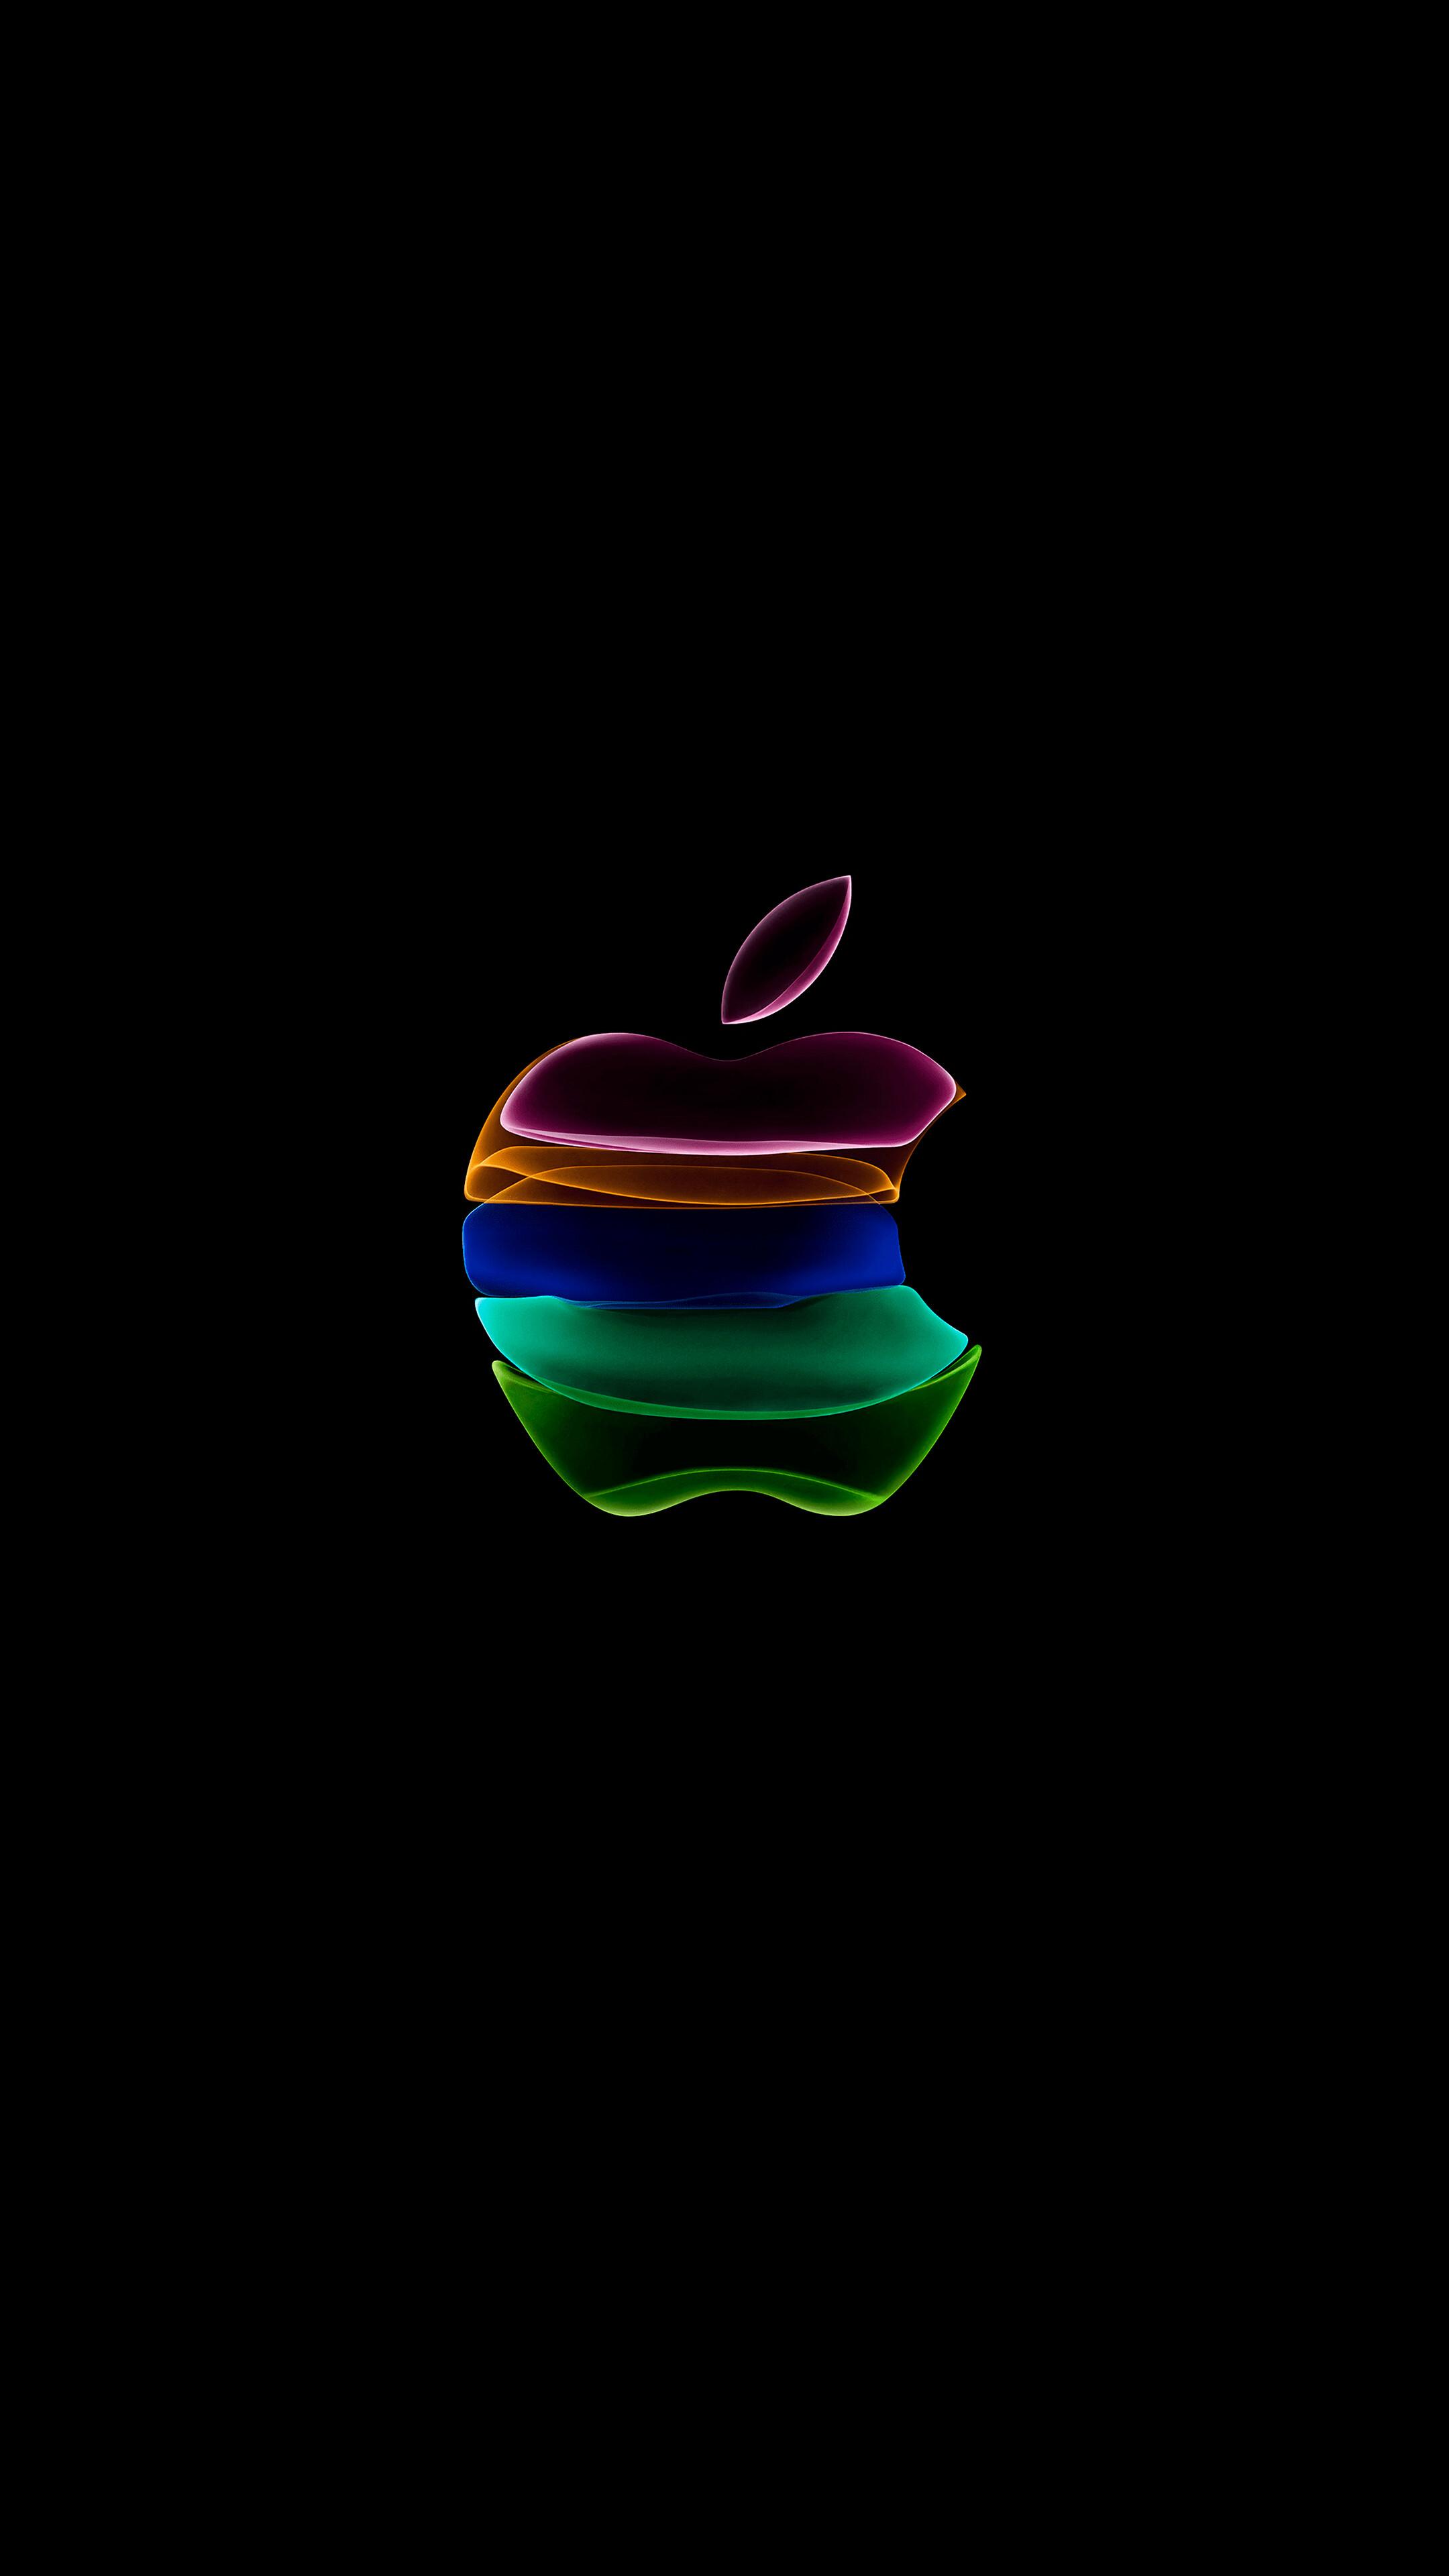 Iphone 11 Apple Logo Black 8k Wallpaper 4 776